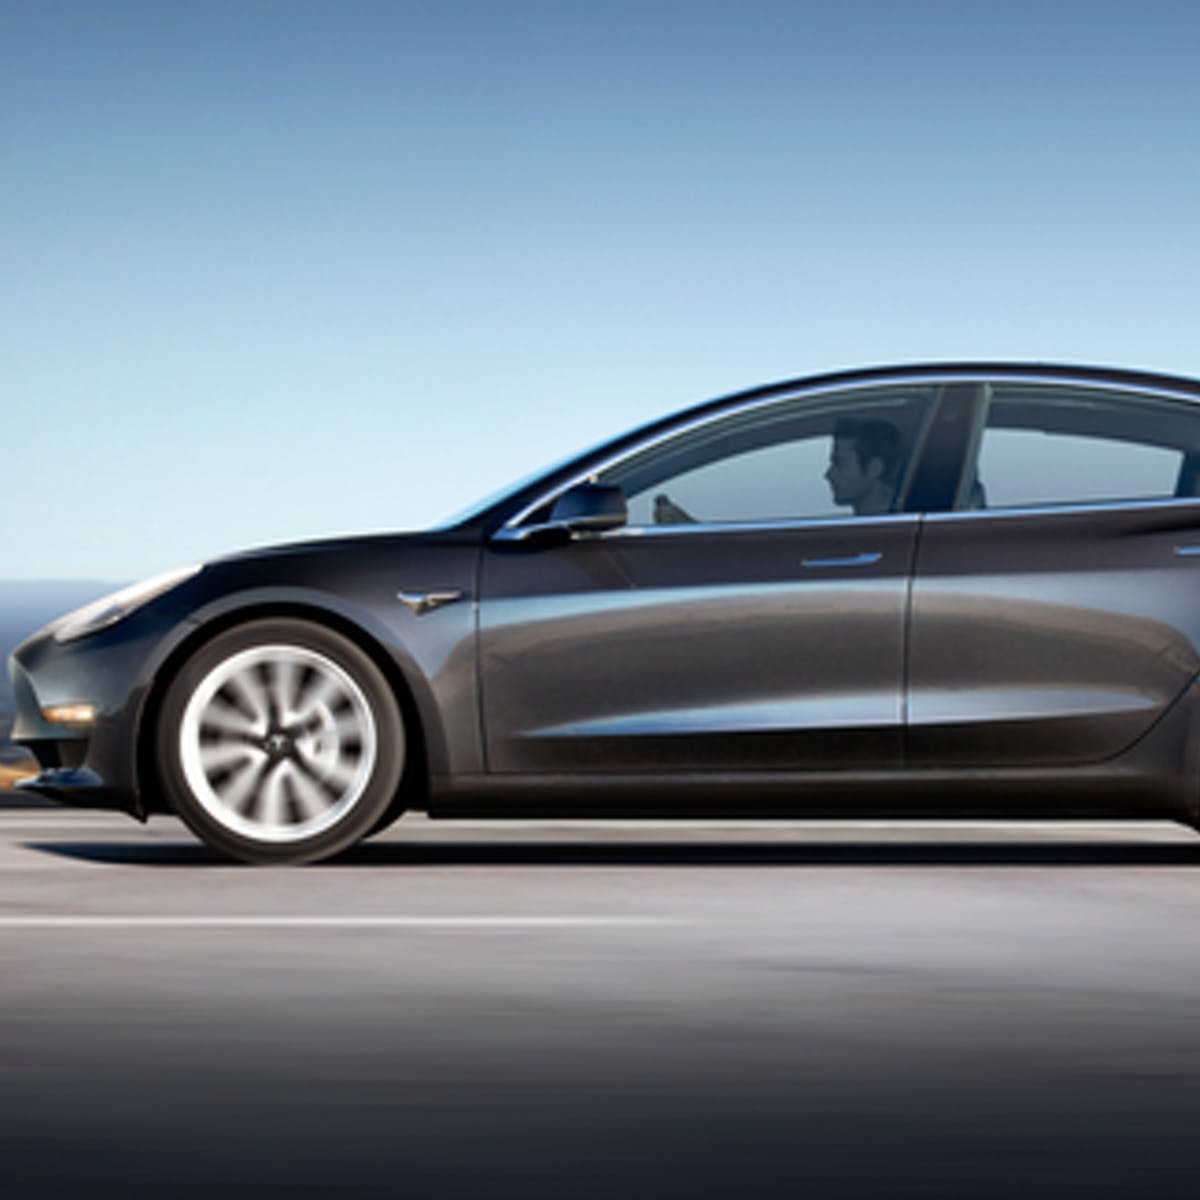 Musk Reads: Gigafactory 4 location revealed